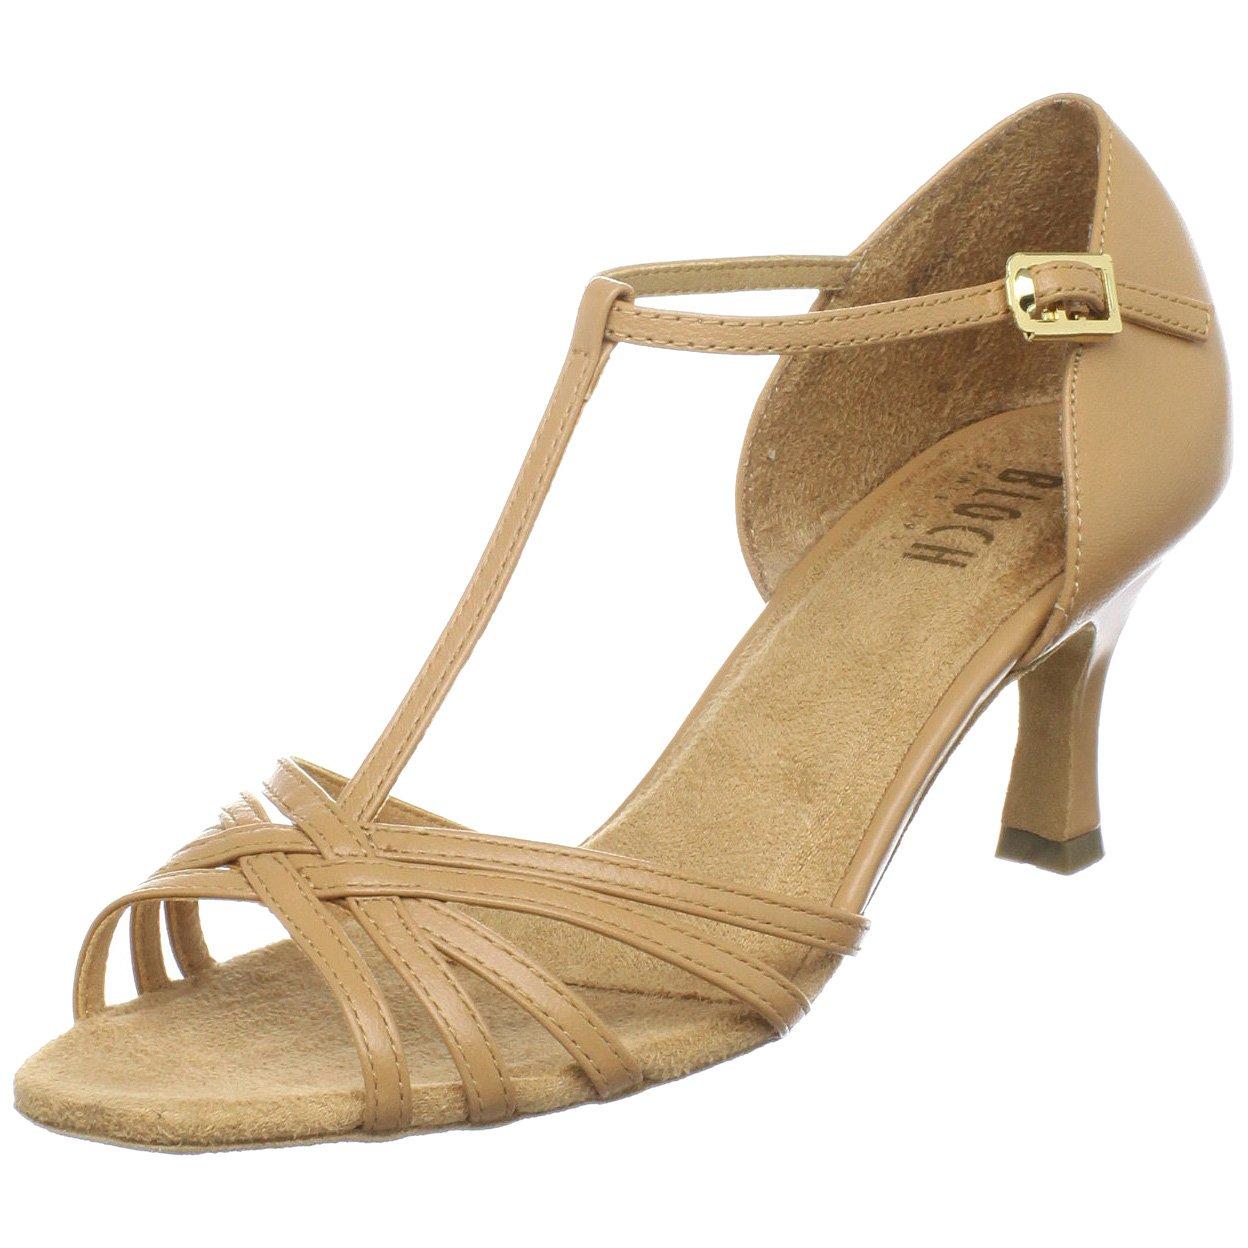 Bloch Women's Nicola Ballroom Shoe,Natural,8 X(Medium) US